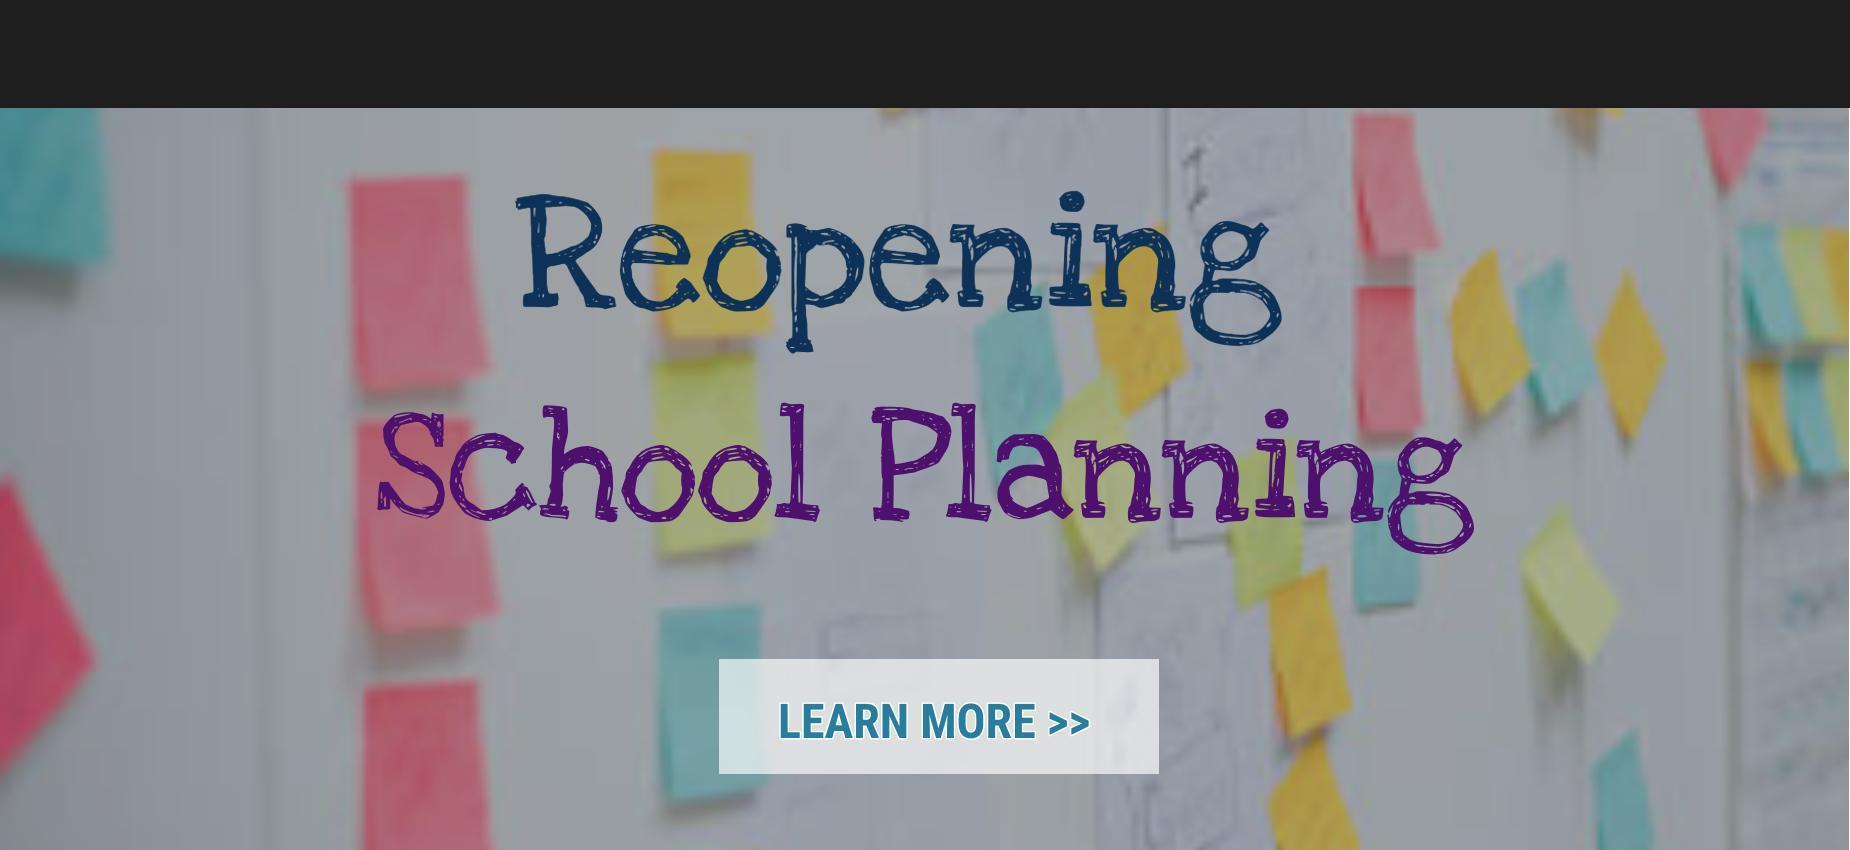 Image, Reopening school planning